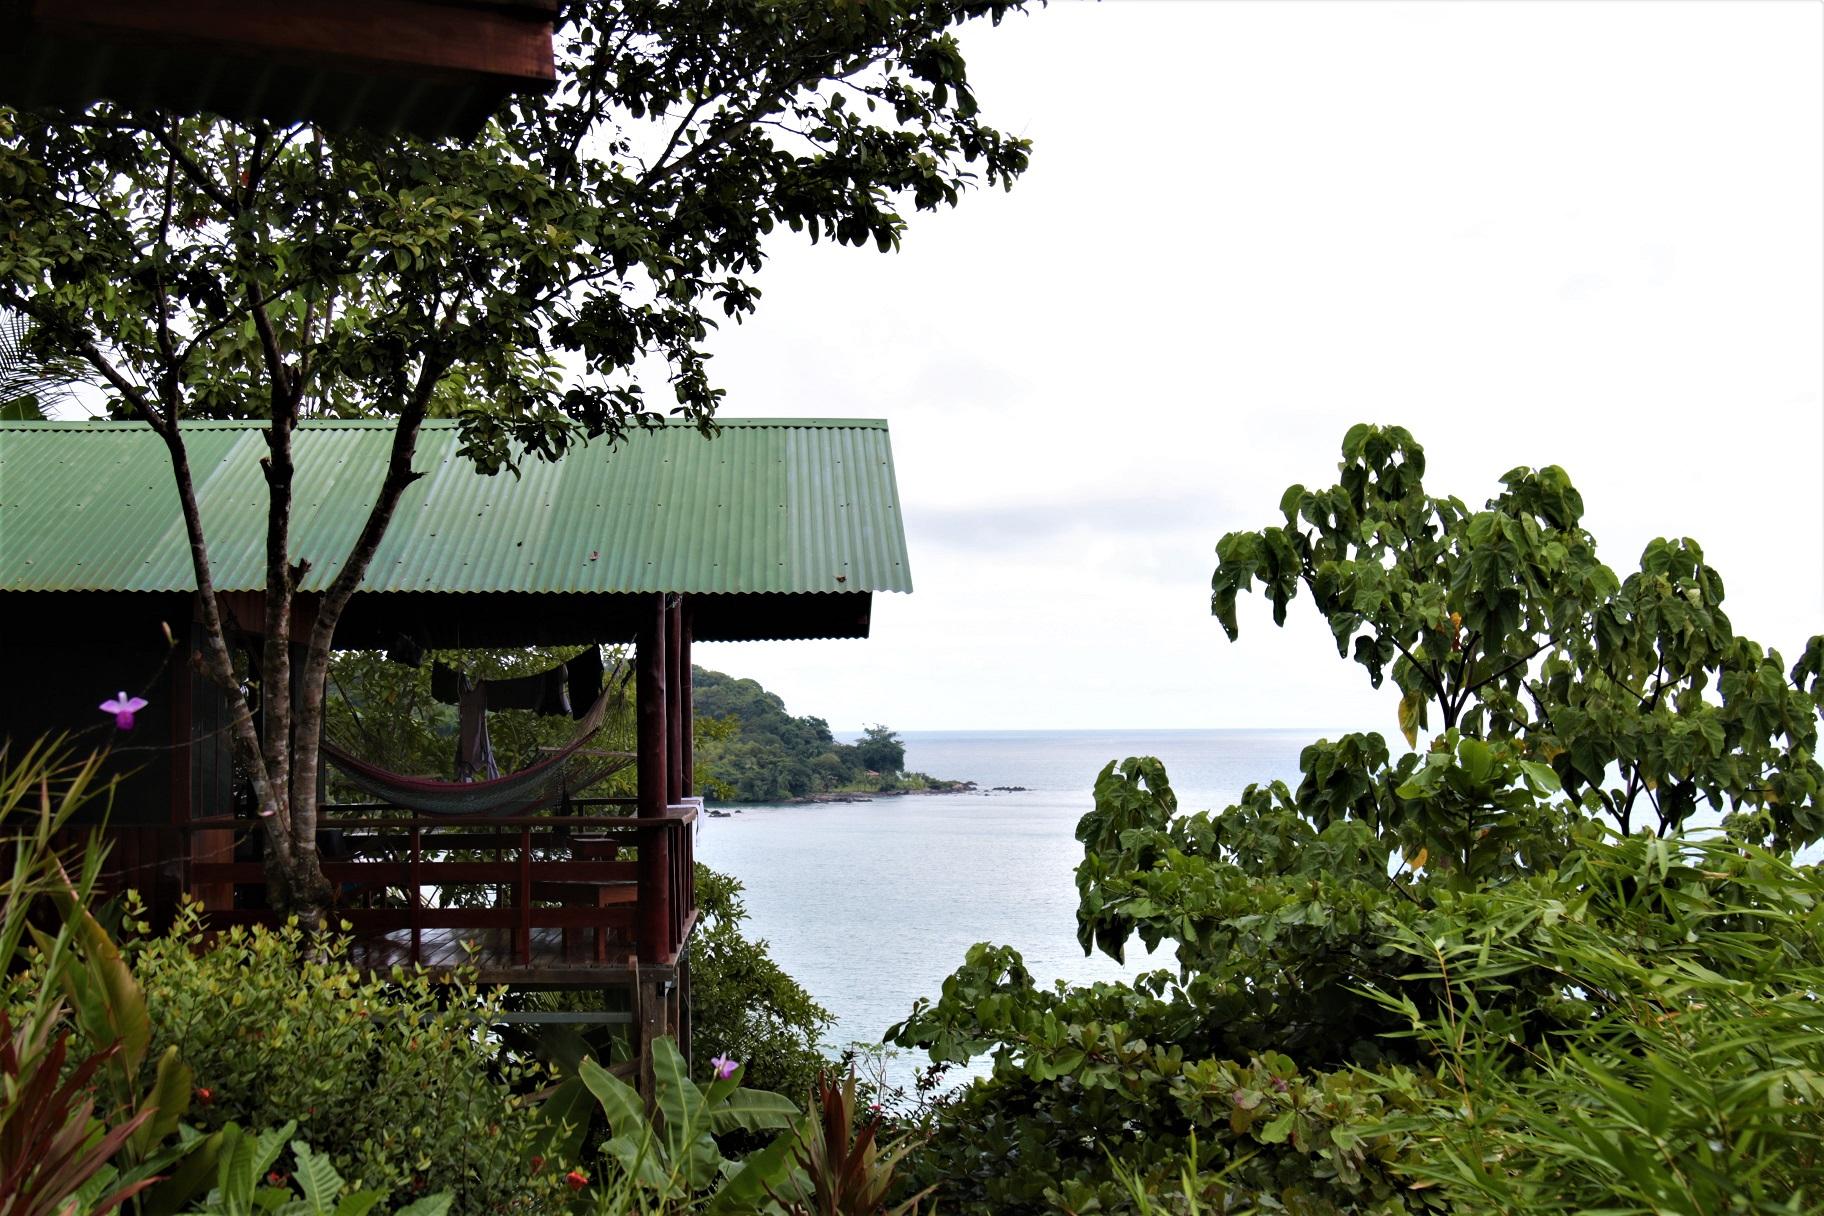 Garden and ocean view-bungalow #3 Drake Bay, Costa Rica